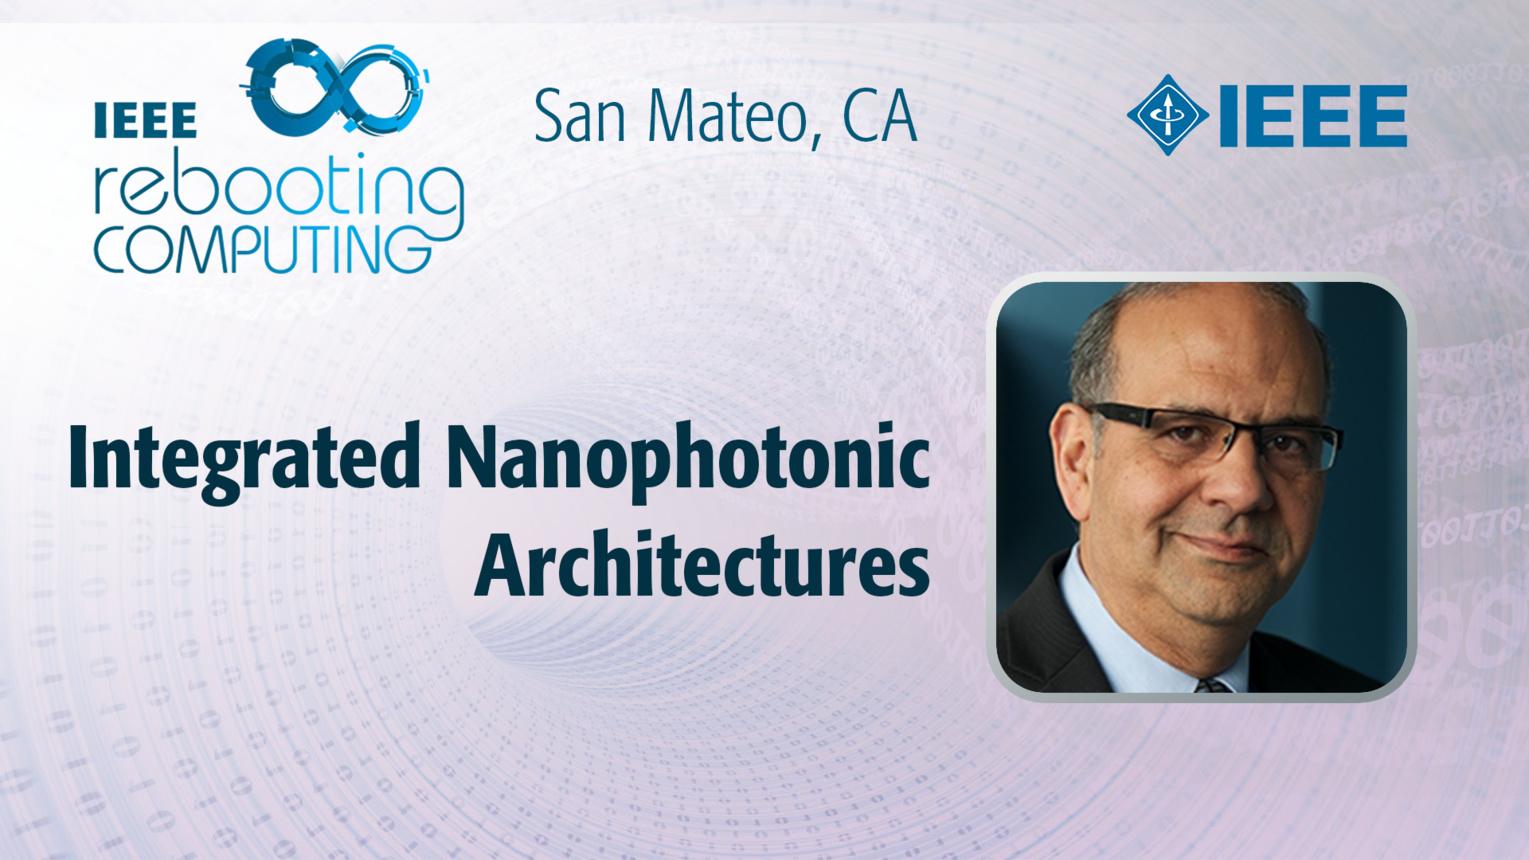 Integrated Nanophotonic Architectures - Tarek El Ghazawi - ICRC San Mateo, 2019